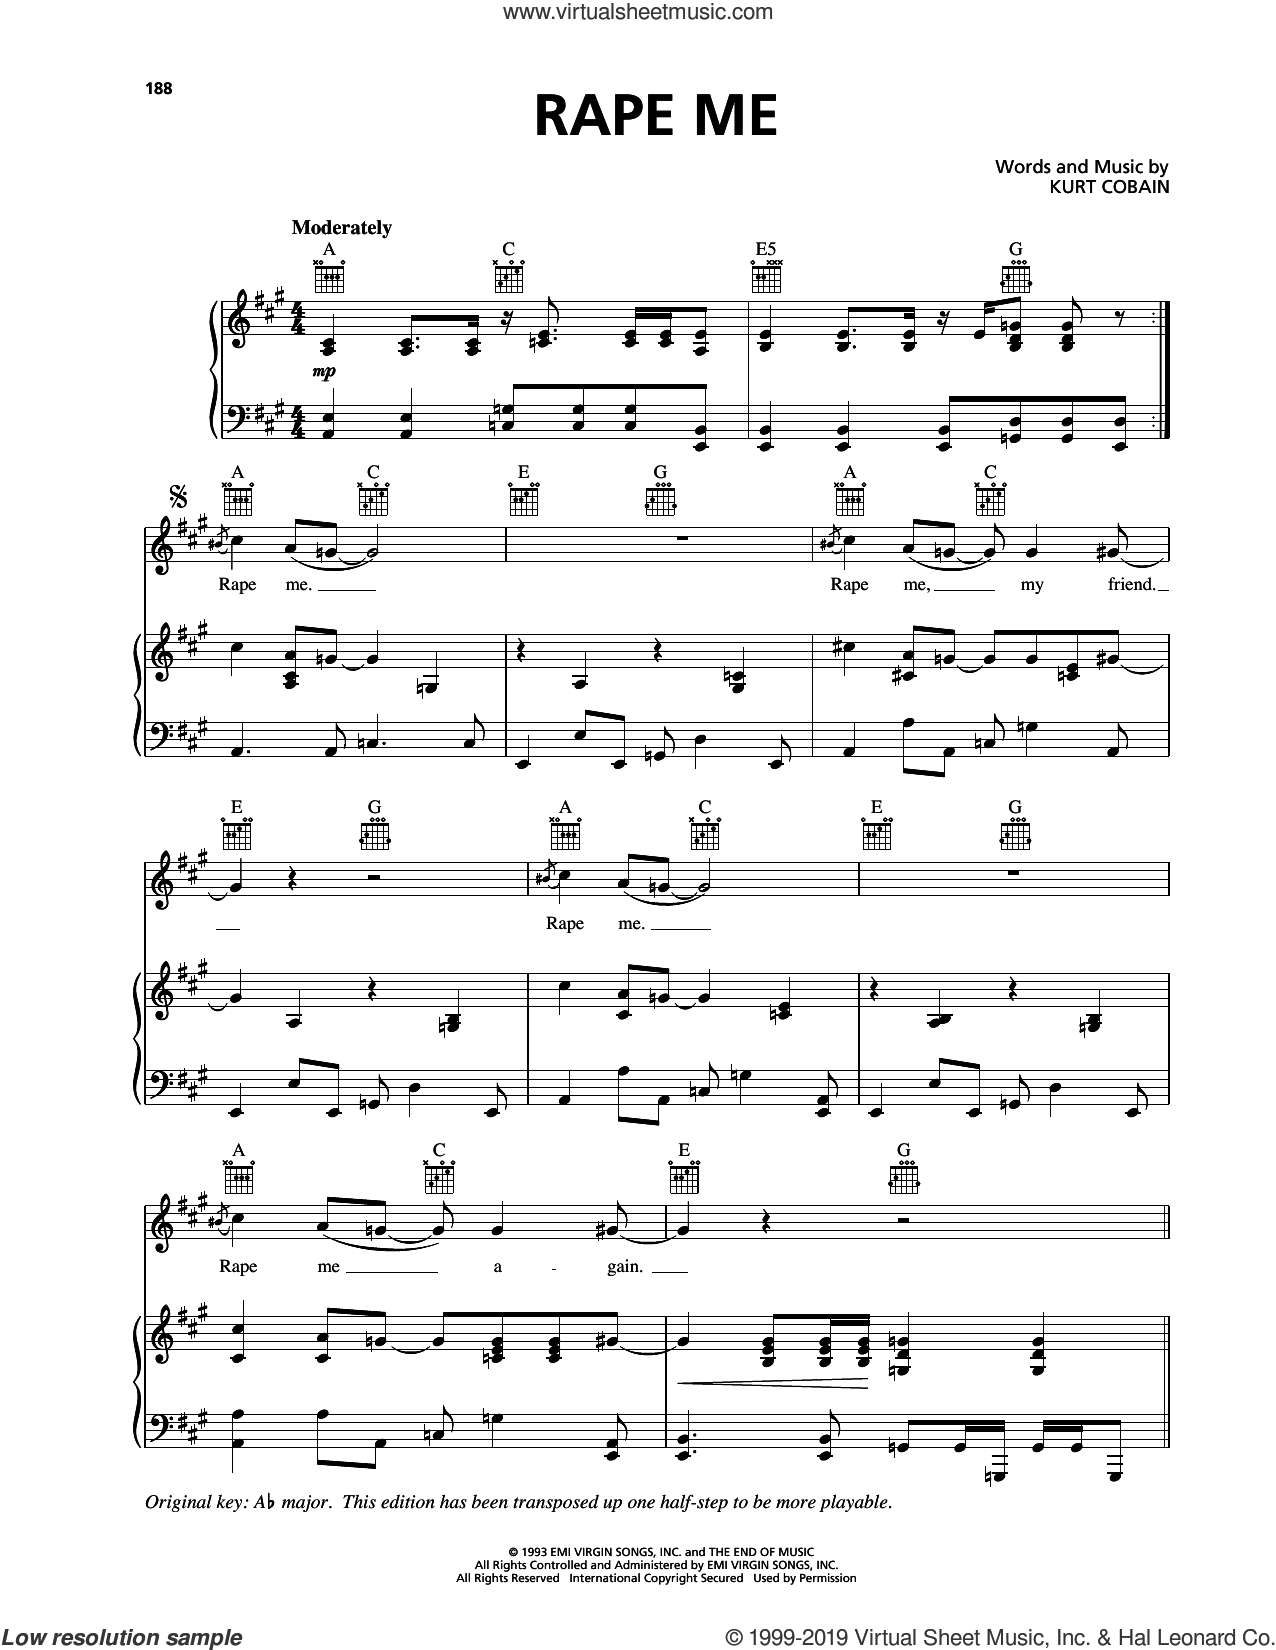 Rape Me sheet music for voice, piano or guitar by Nirvana and Kurt Cobain, intermediate skill level